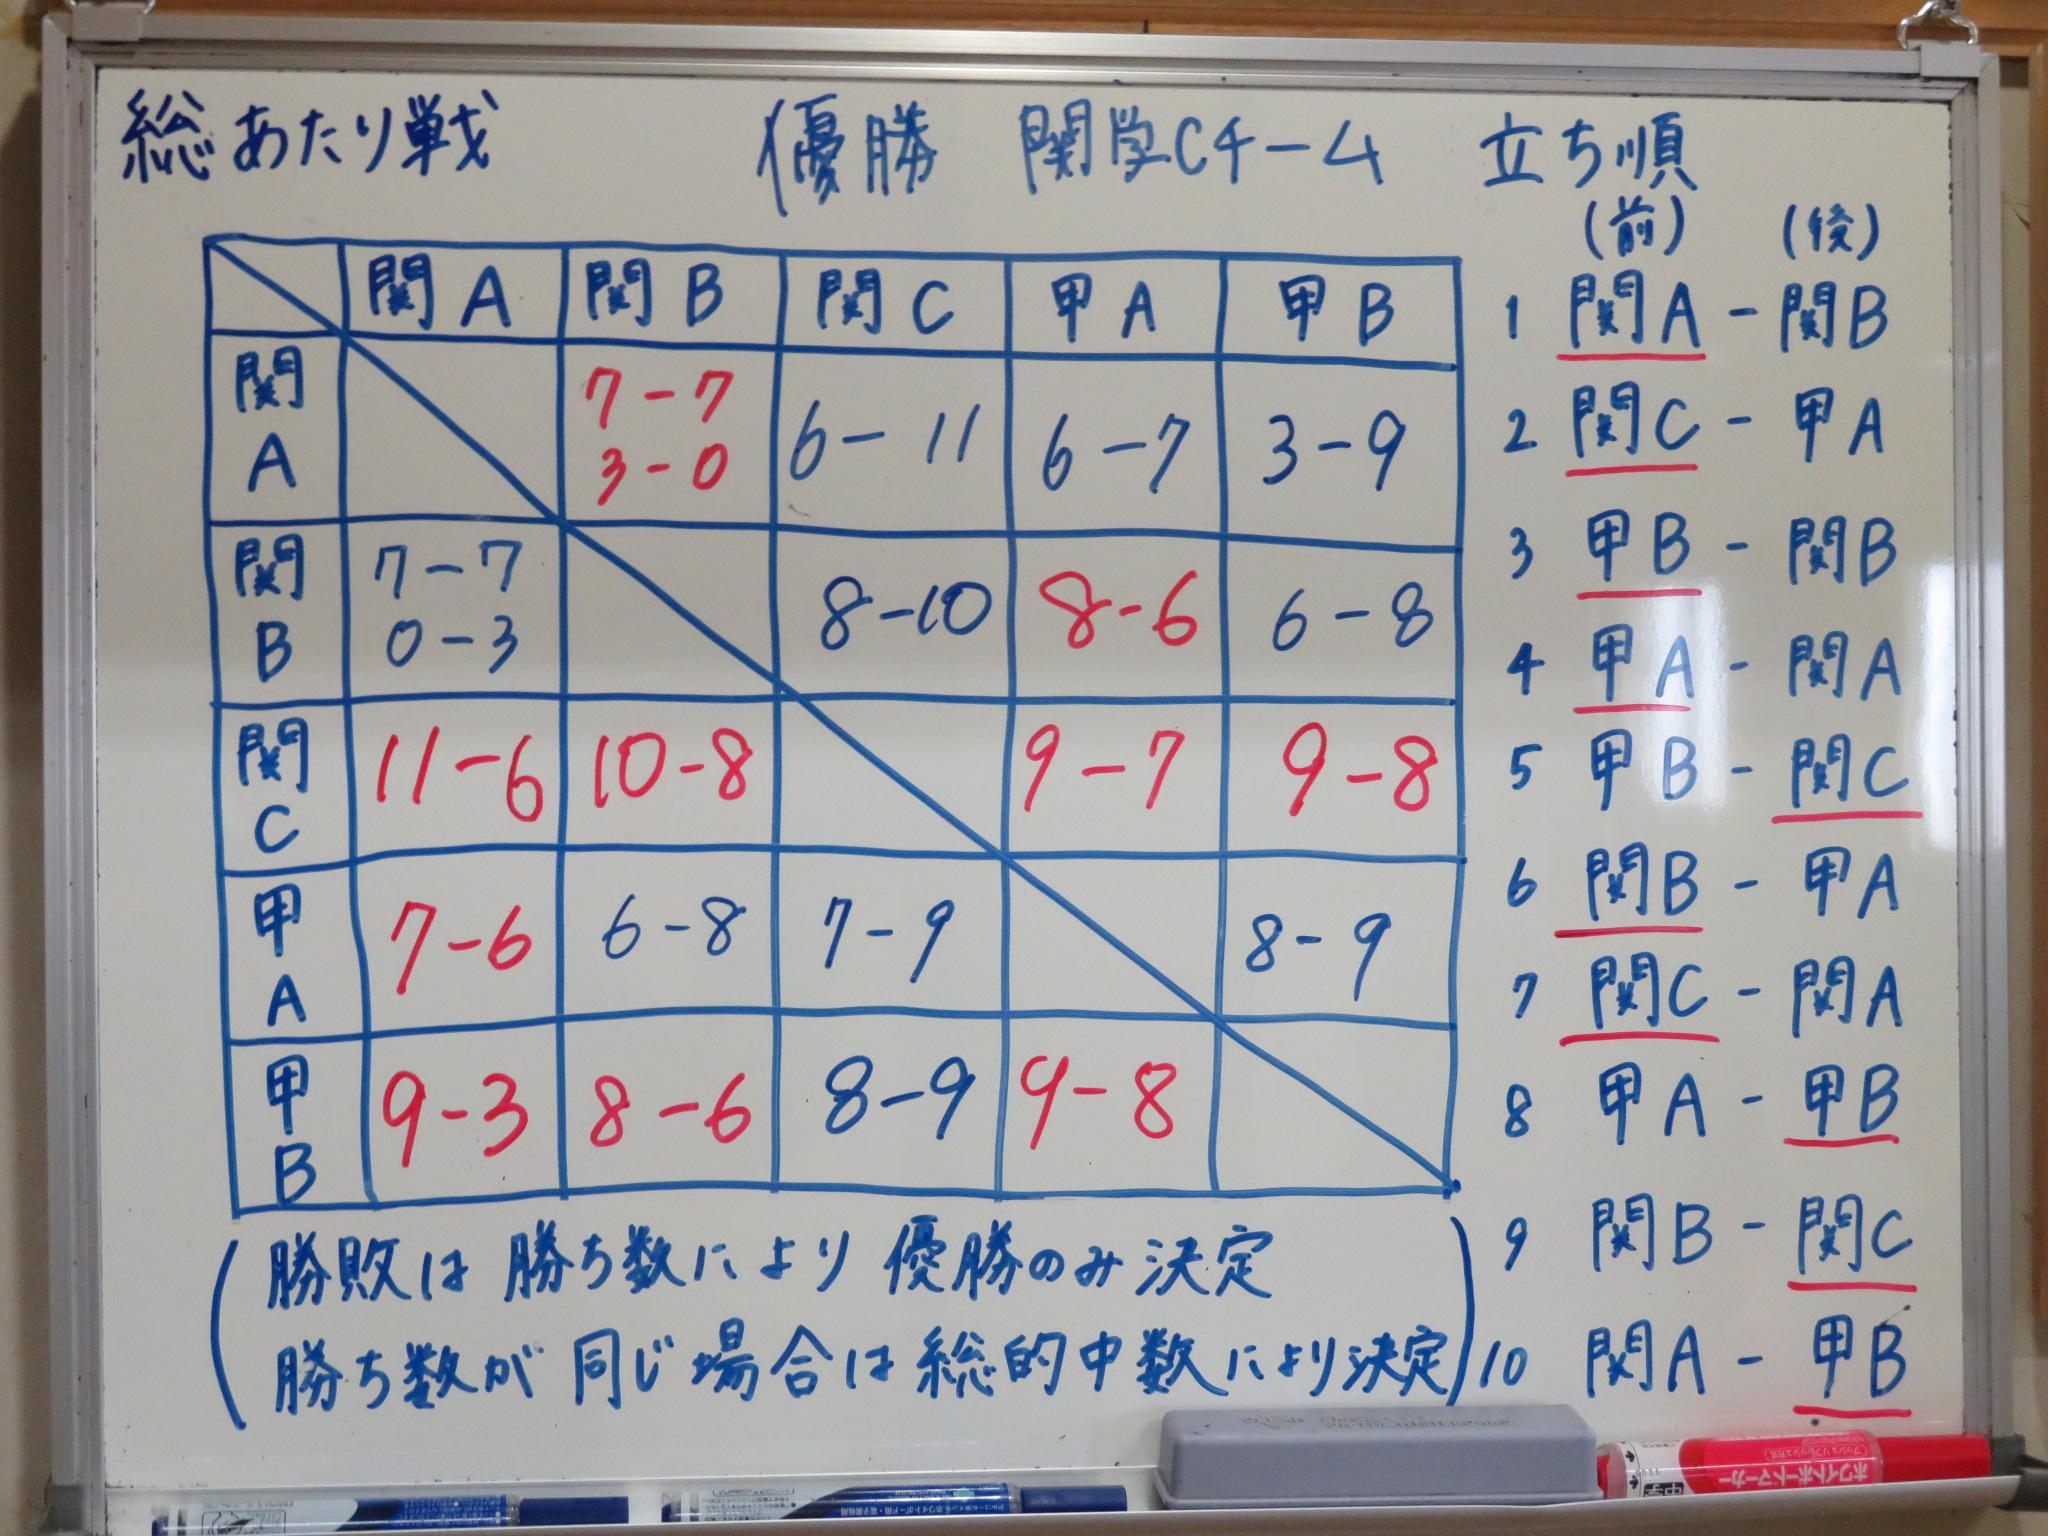 優勝 関学Cチーム 4勝0敗